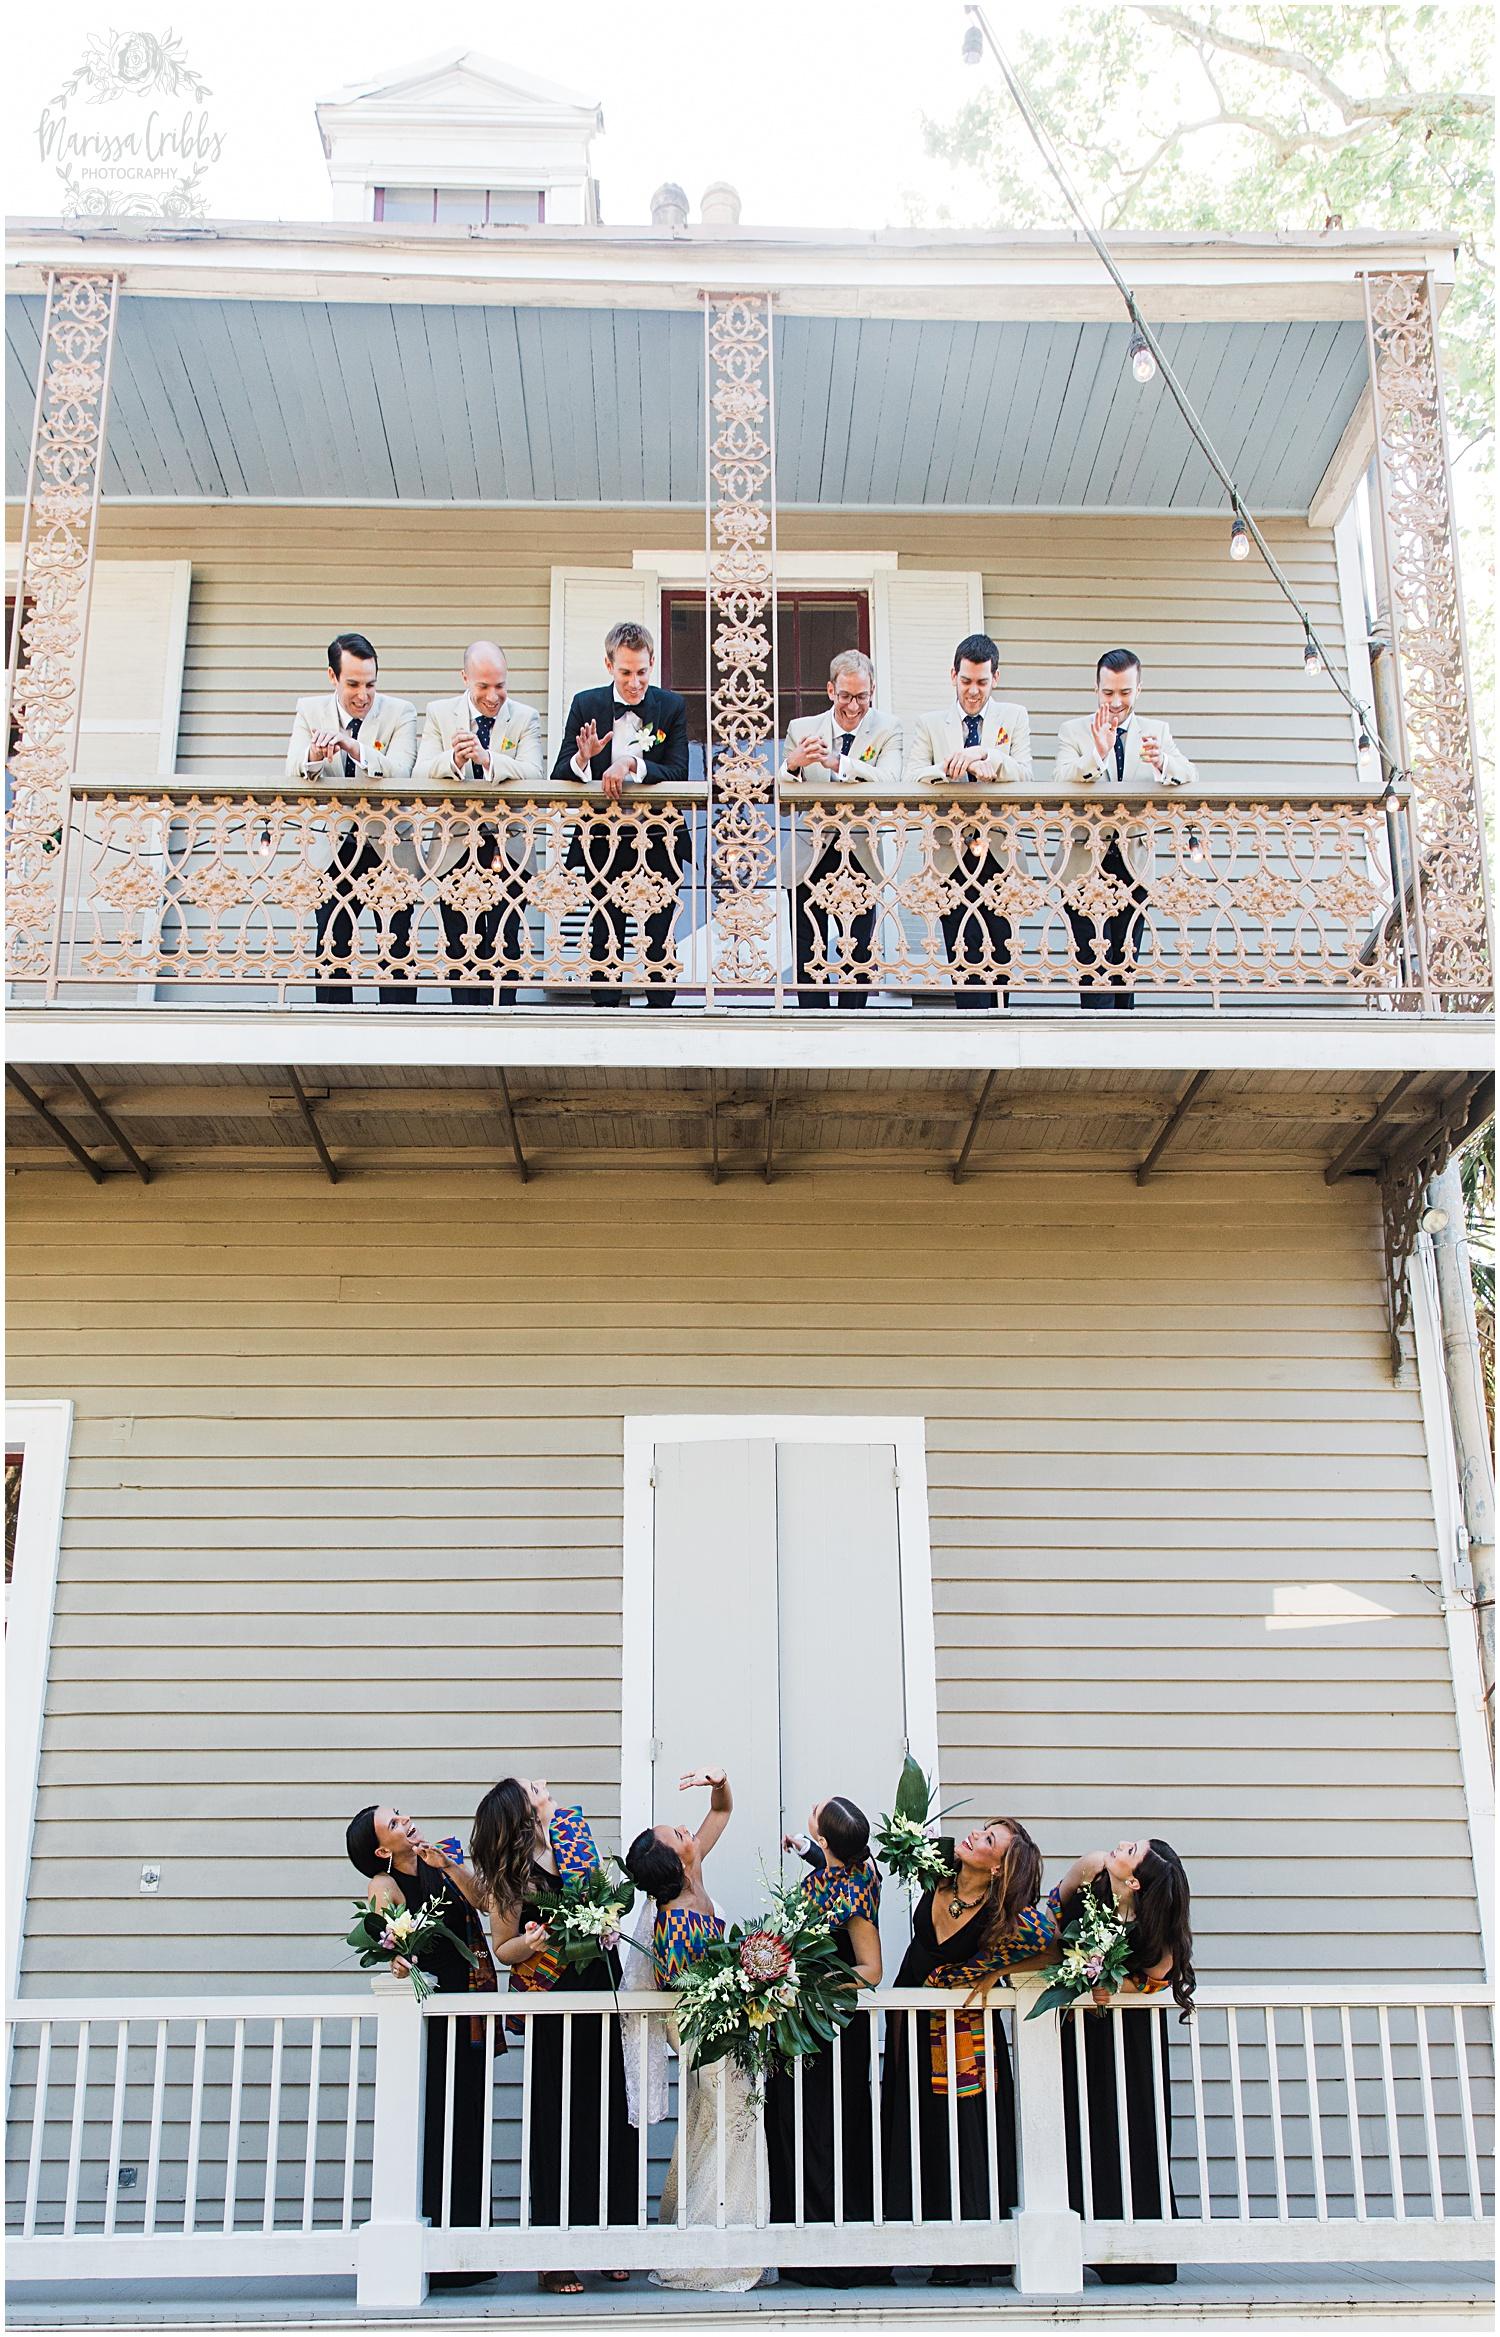 NEW ORLEANS WEDDING   BENACHI HOUSE   SARAH & MICHAEL   MARISSA CRIBBS PHOTOGRAPHY_4435.jpg